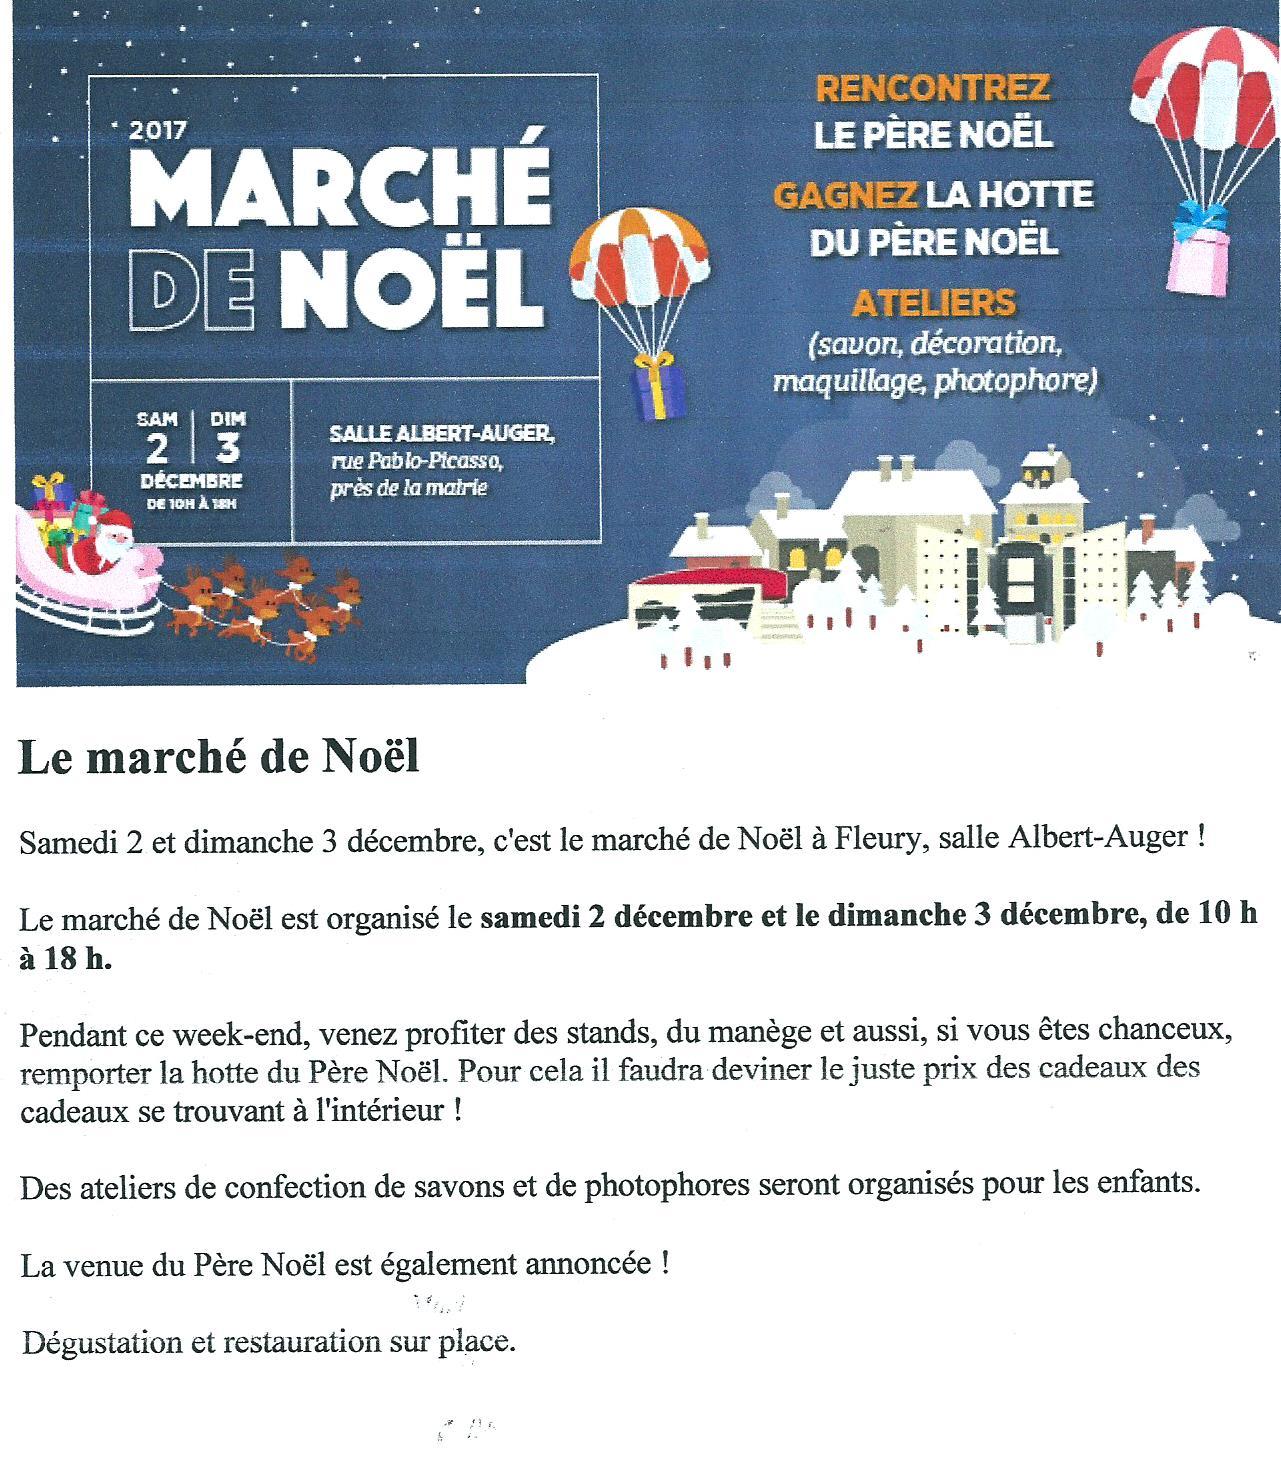 Scan Affiche Marché de Noël 2017 (2-3.12.2017).jpg